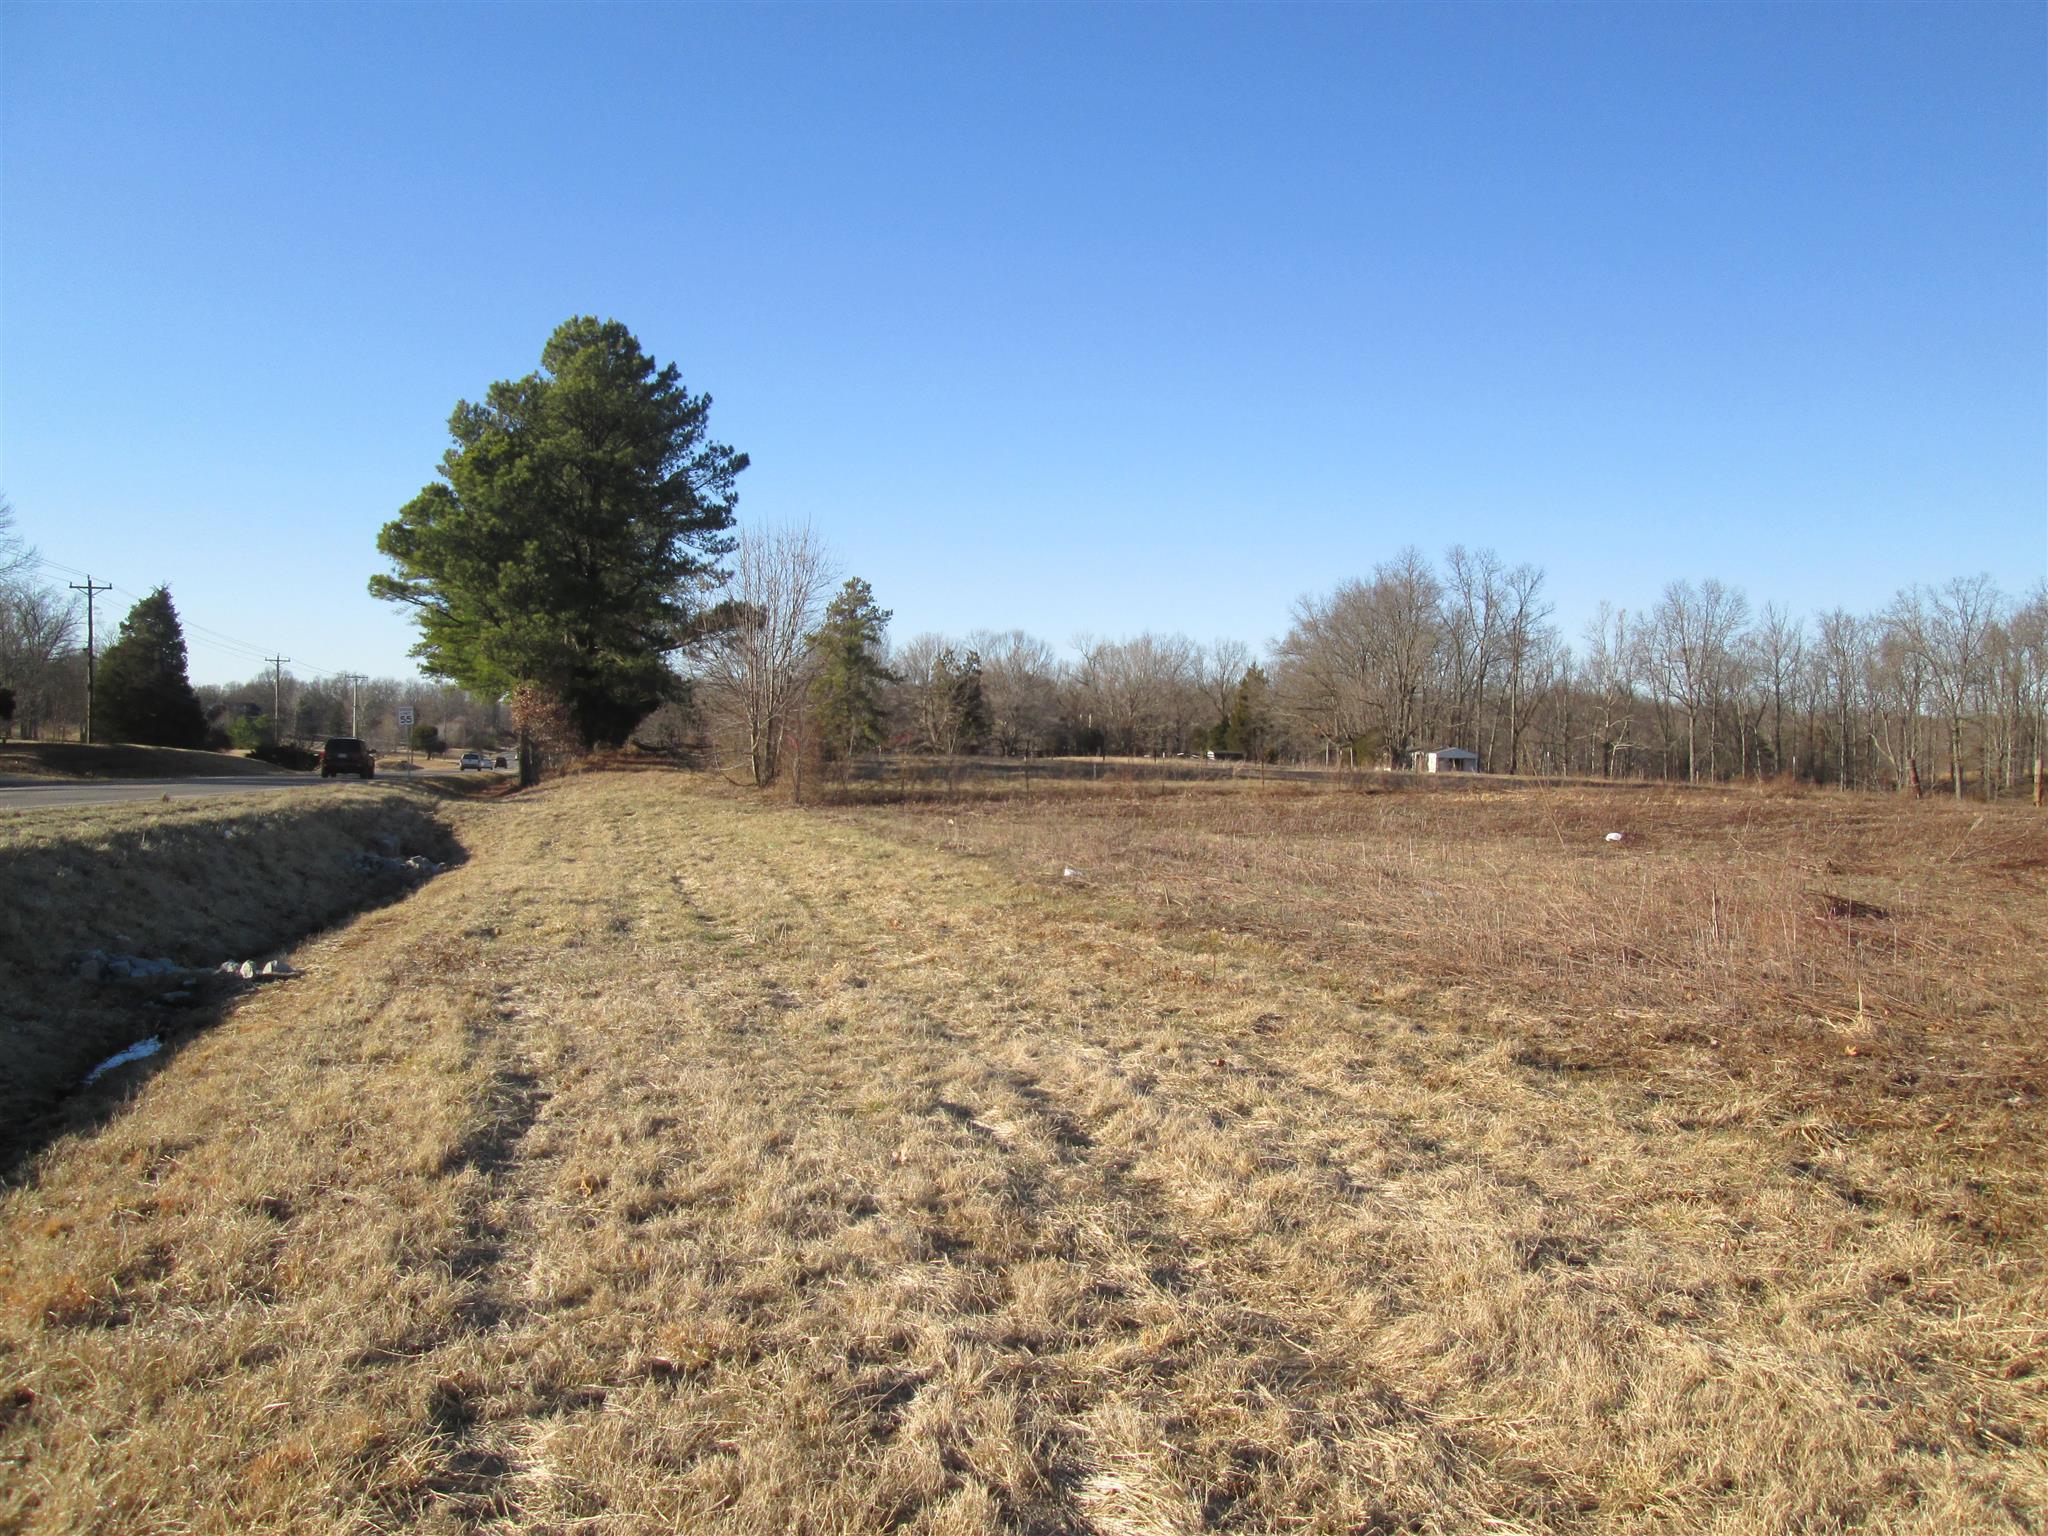 5353 Ashland City, Clarksville, TN 37043 - Clarksville, TN real estate listing